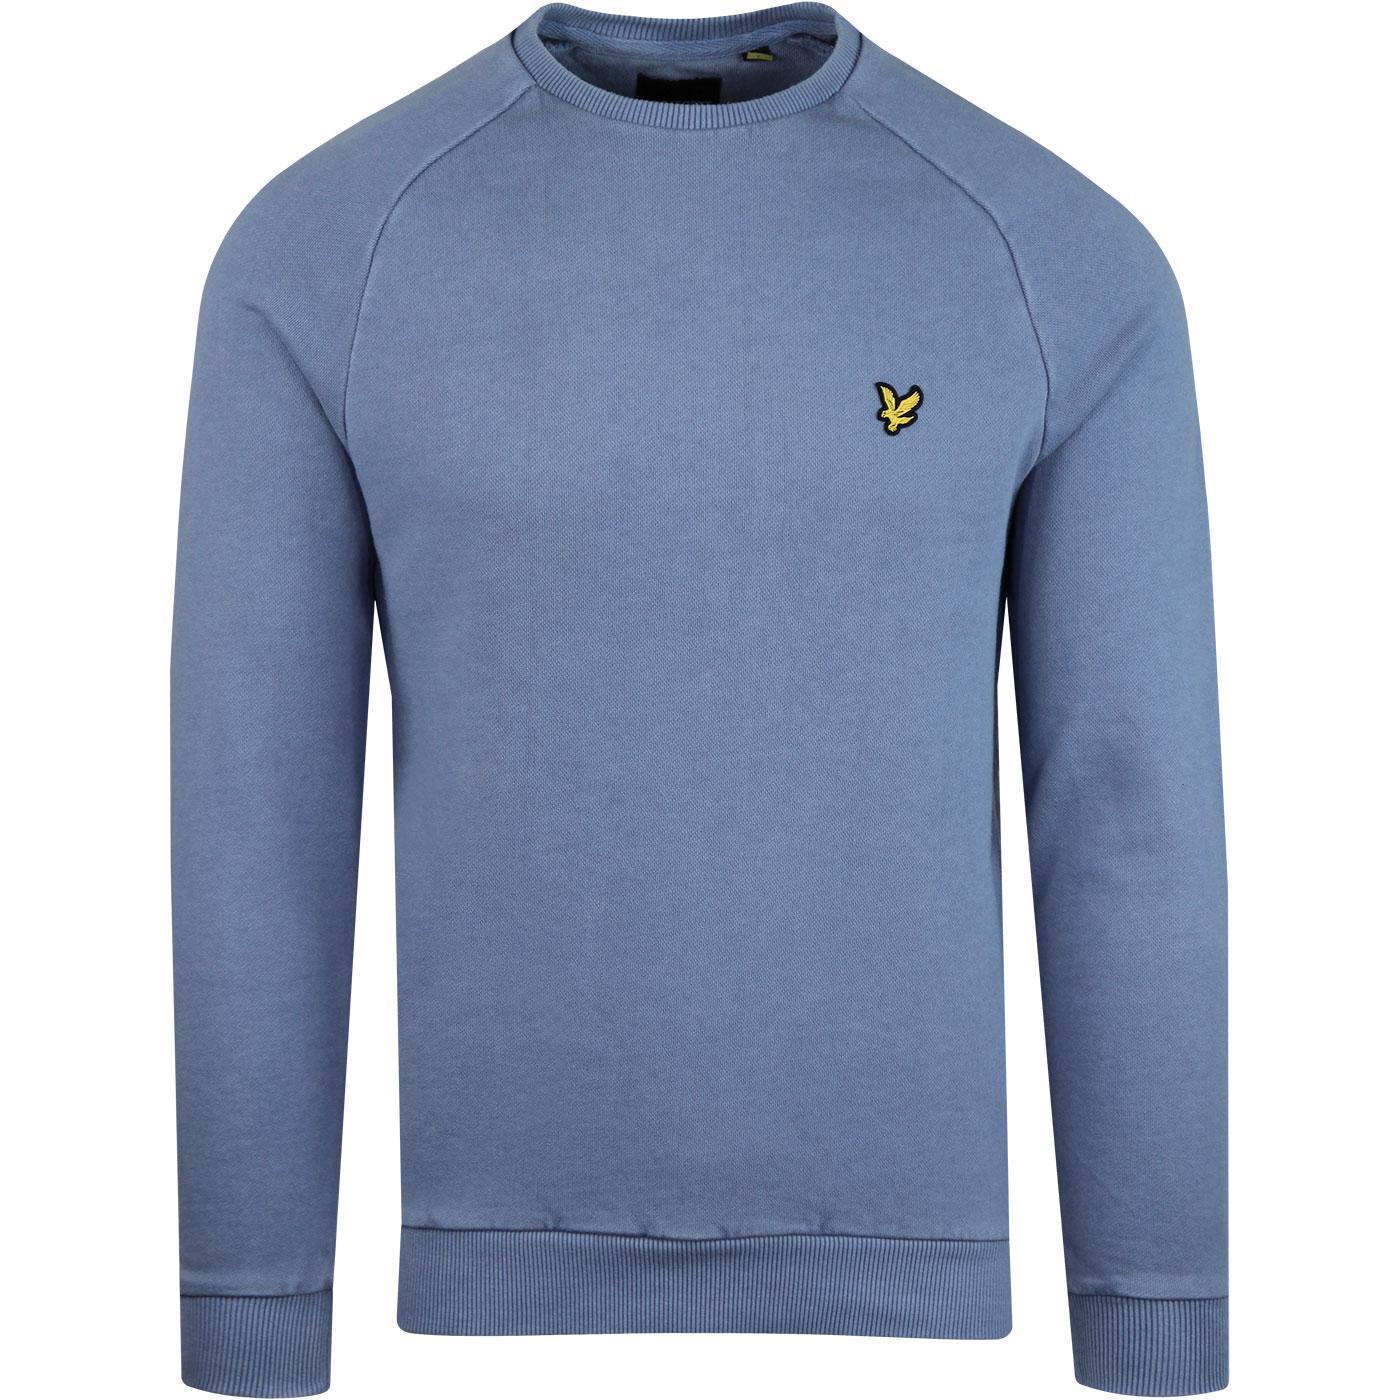 Snow Washed LYLE & SCOTT Retro Sweatshirt Blue